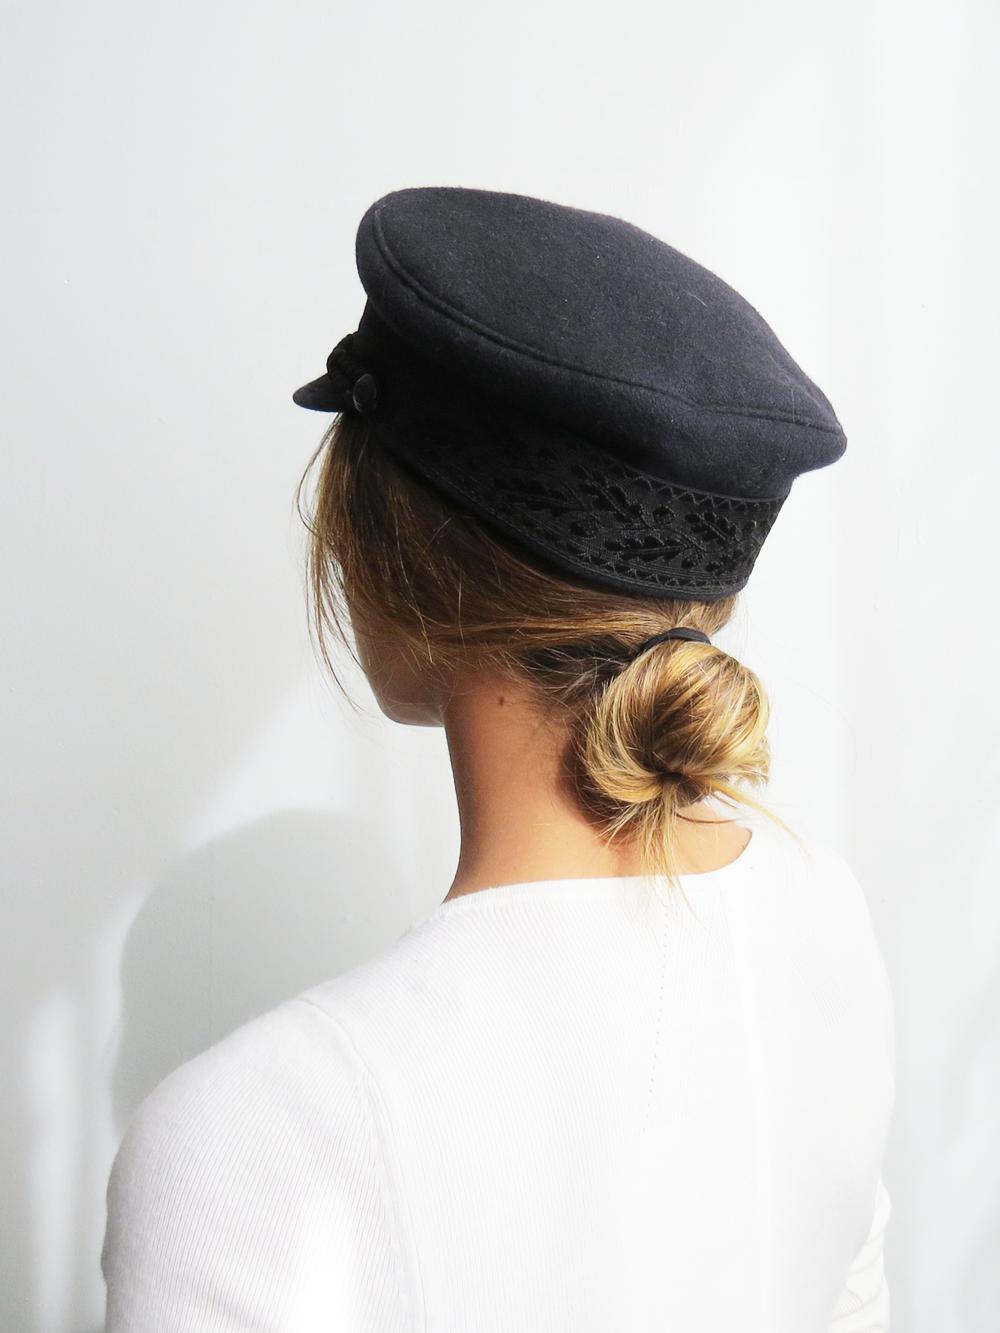 124f4ae339f0f Mariner Captain s Hat